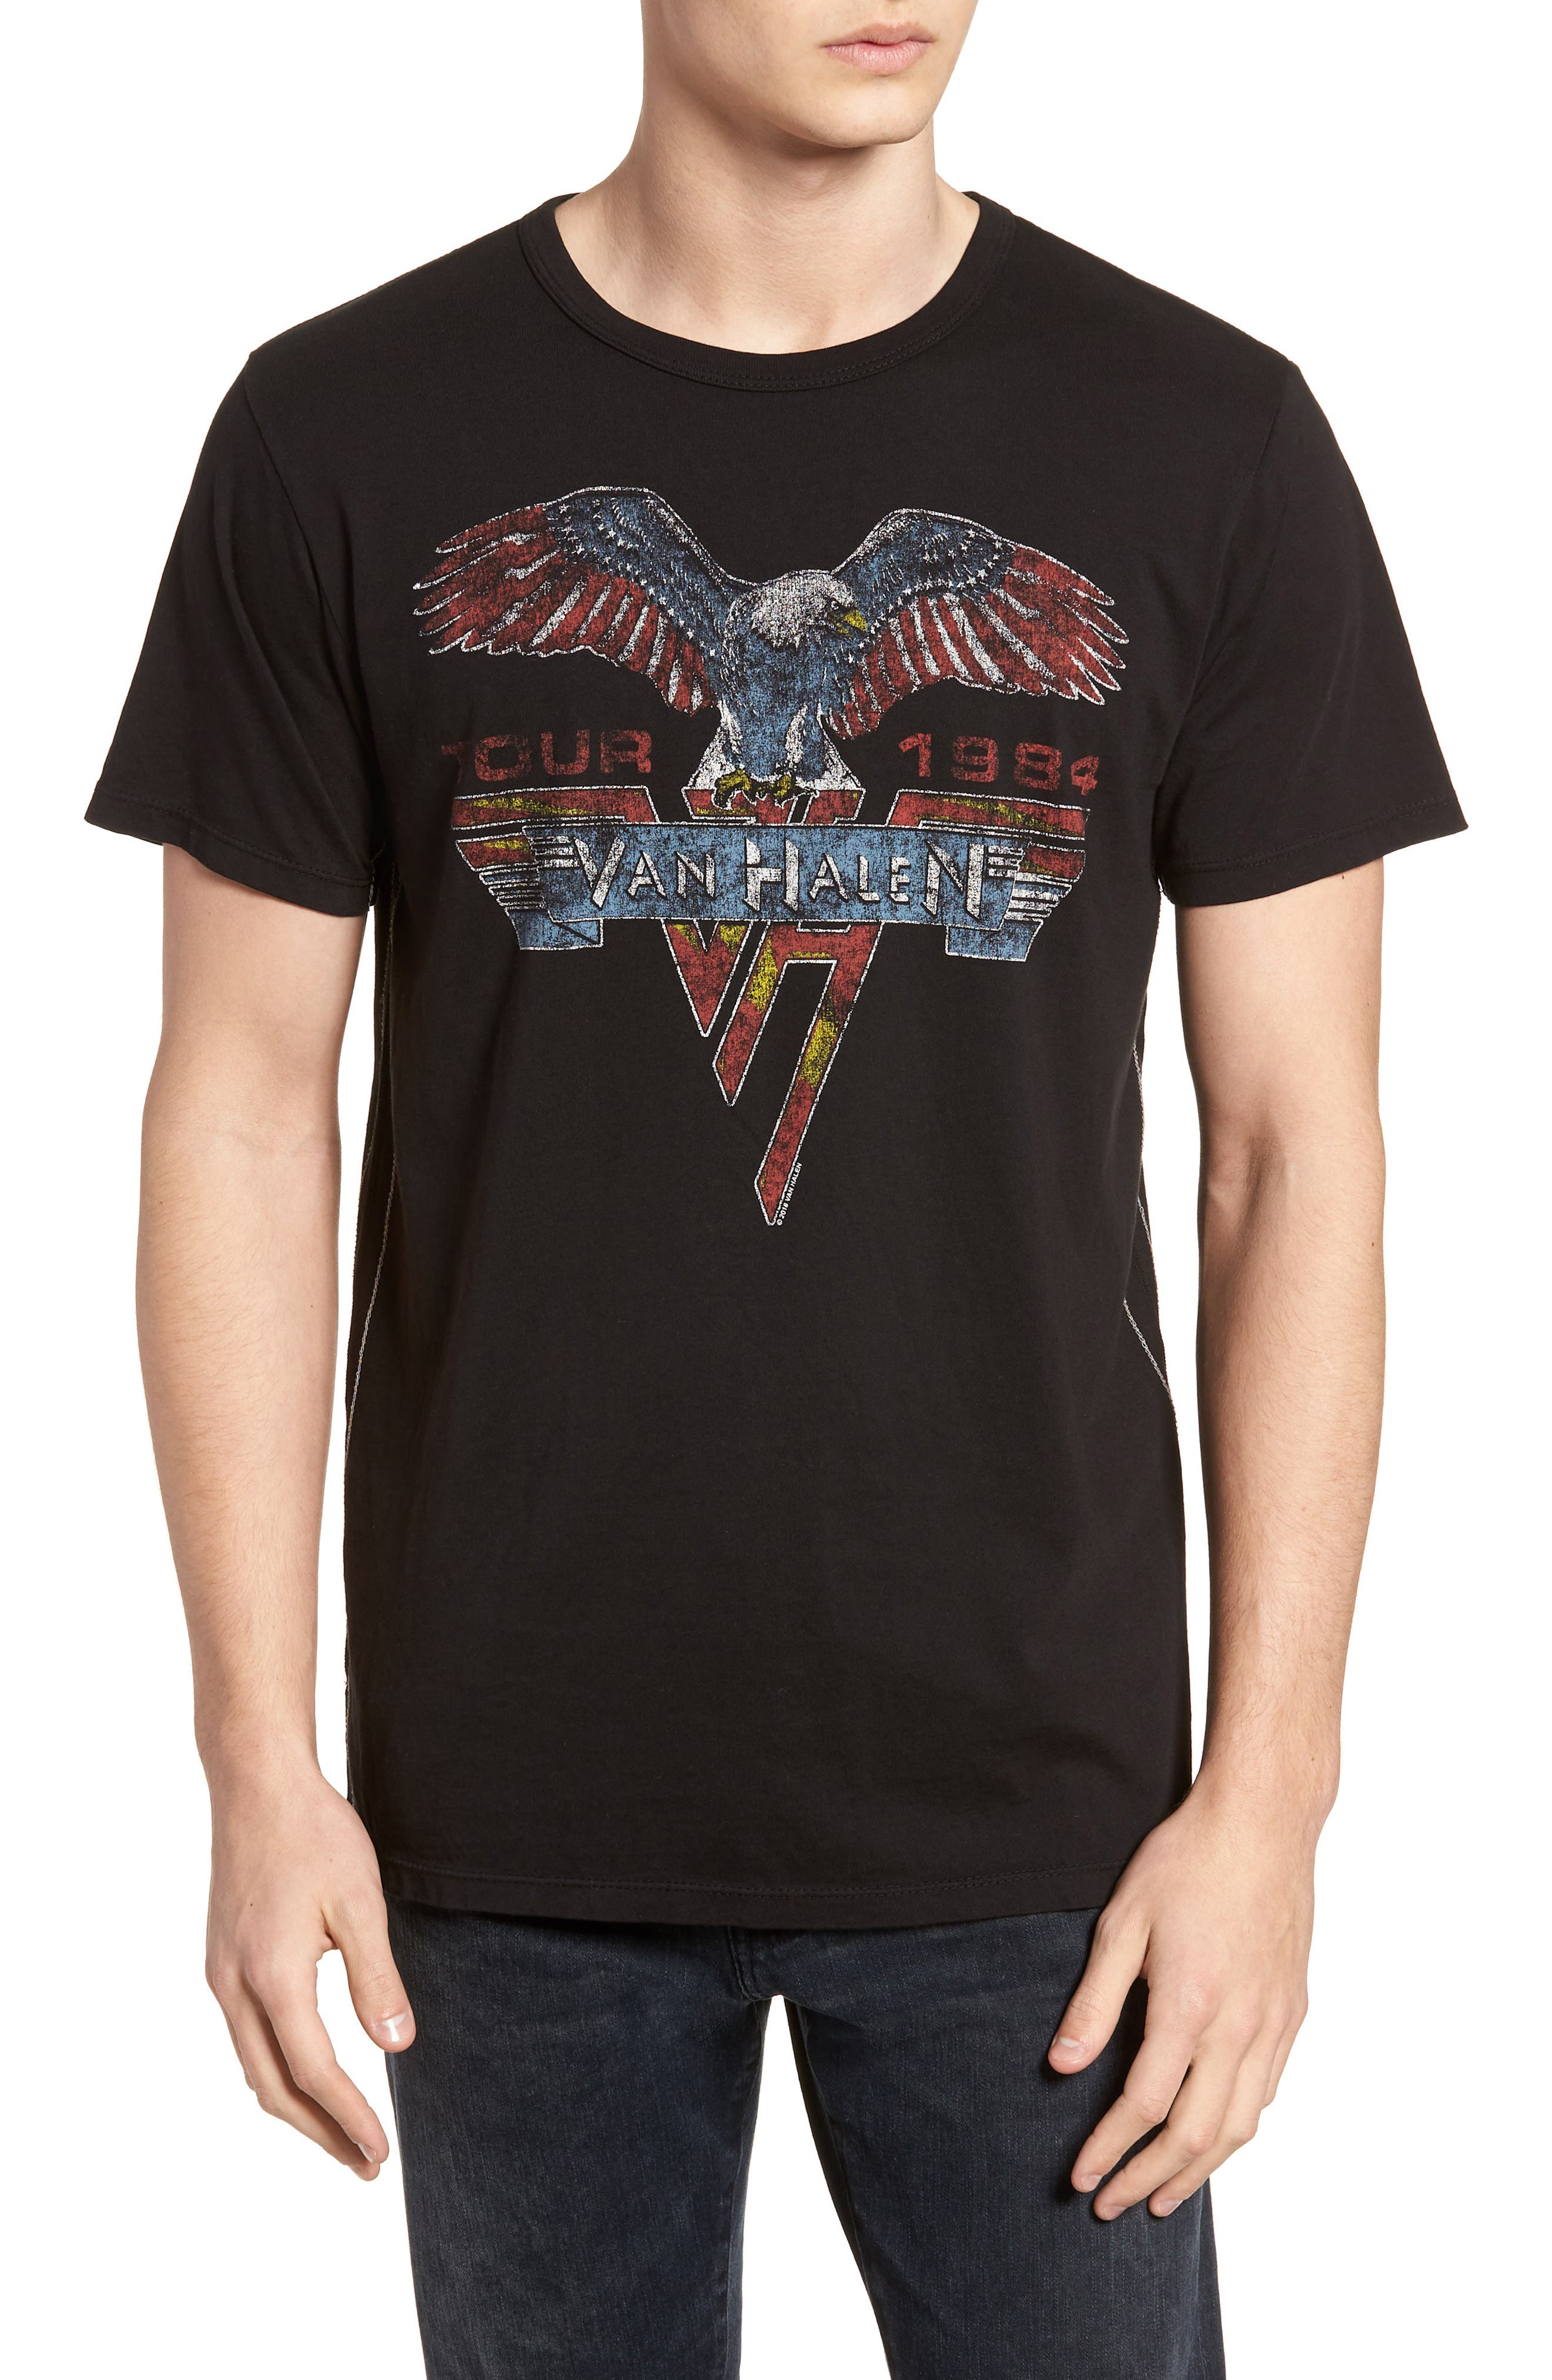 Van Halen T-Shirt,                             Main thumbnail 1, color,                             001